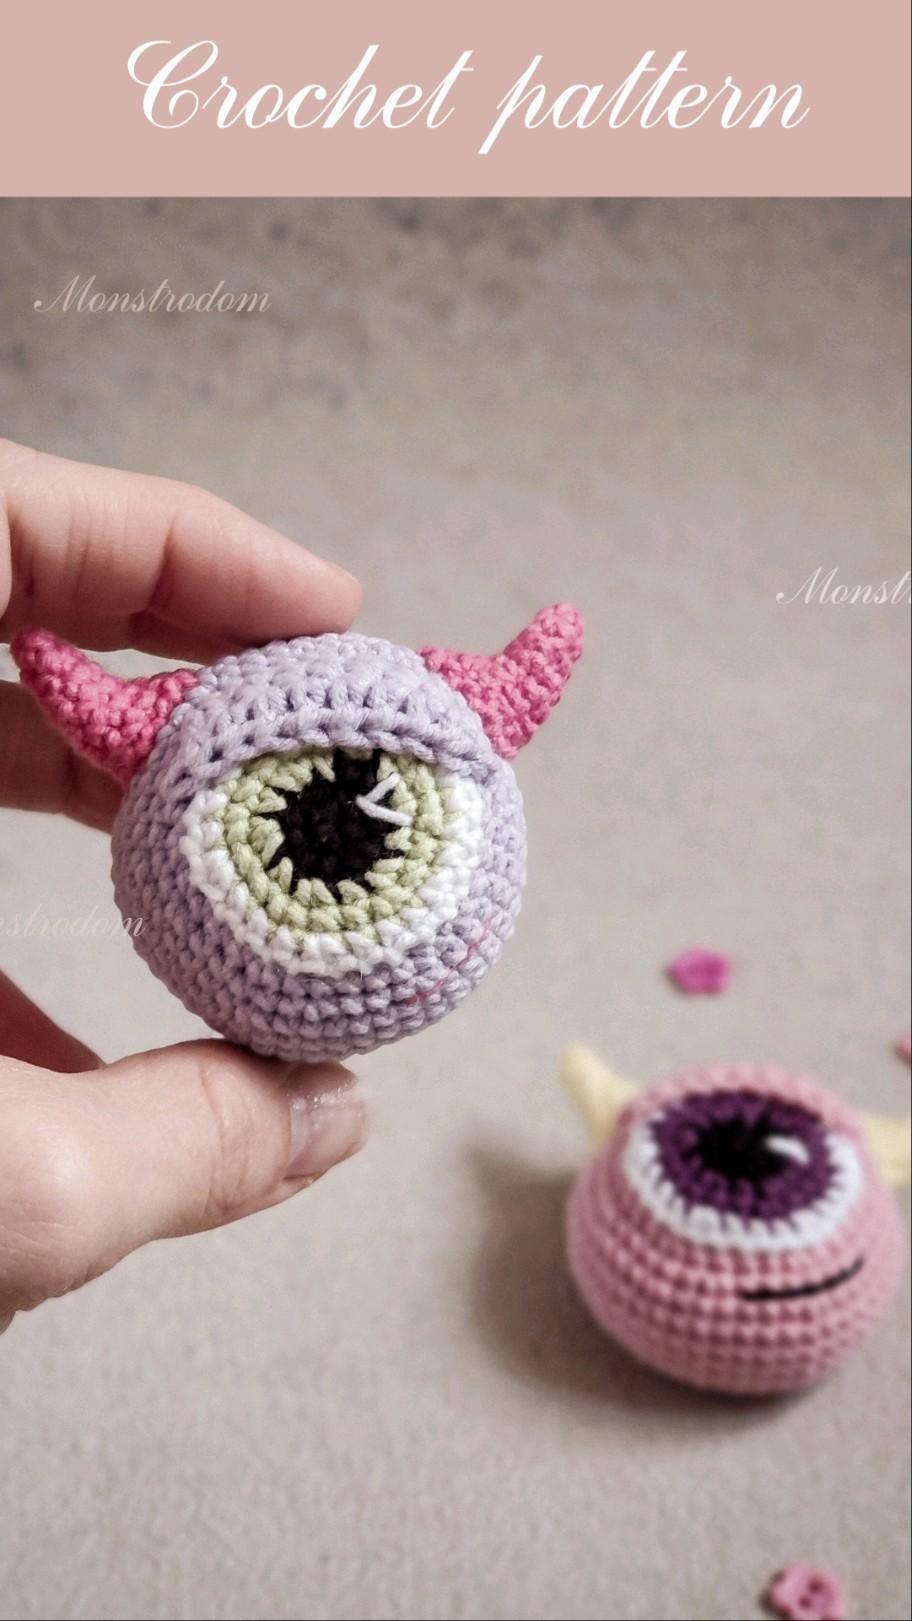 Crochet pattern Monster / Crochet pattern brooch /